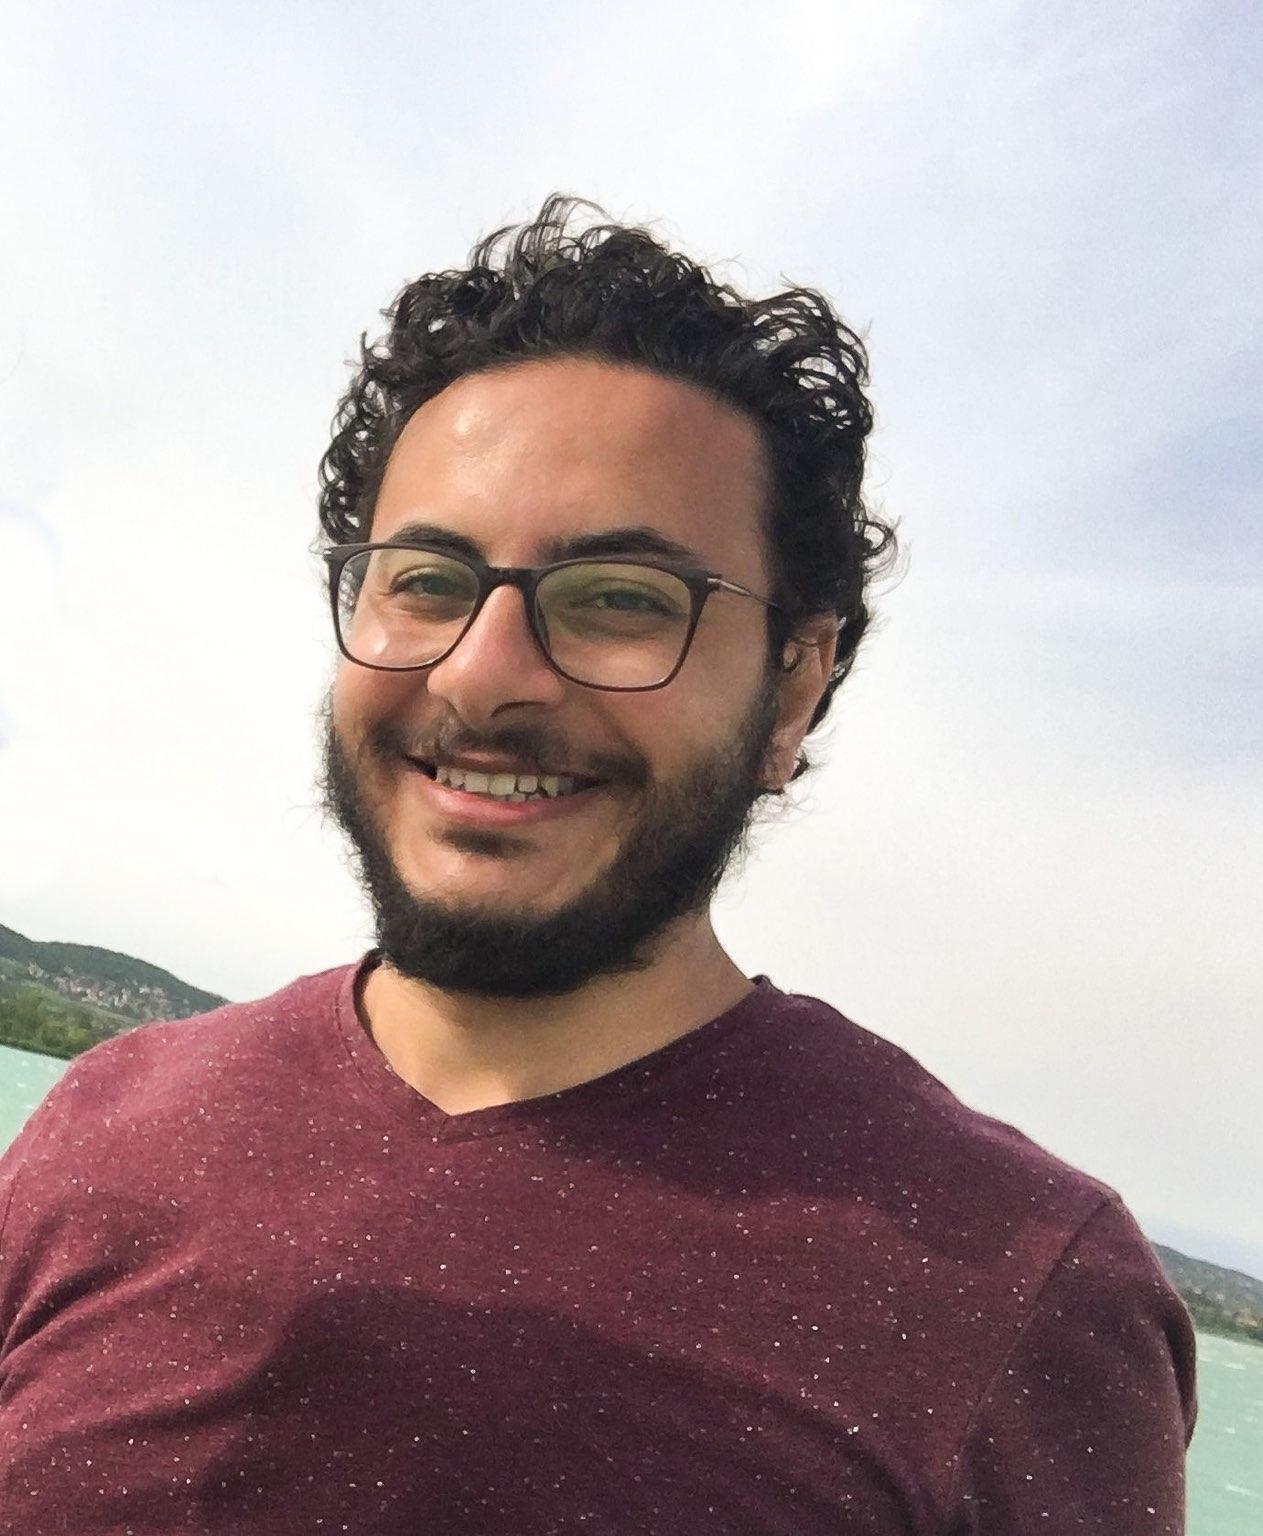 Urgent Action: Free Ahmed Samir Santawy